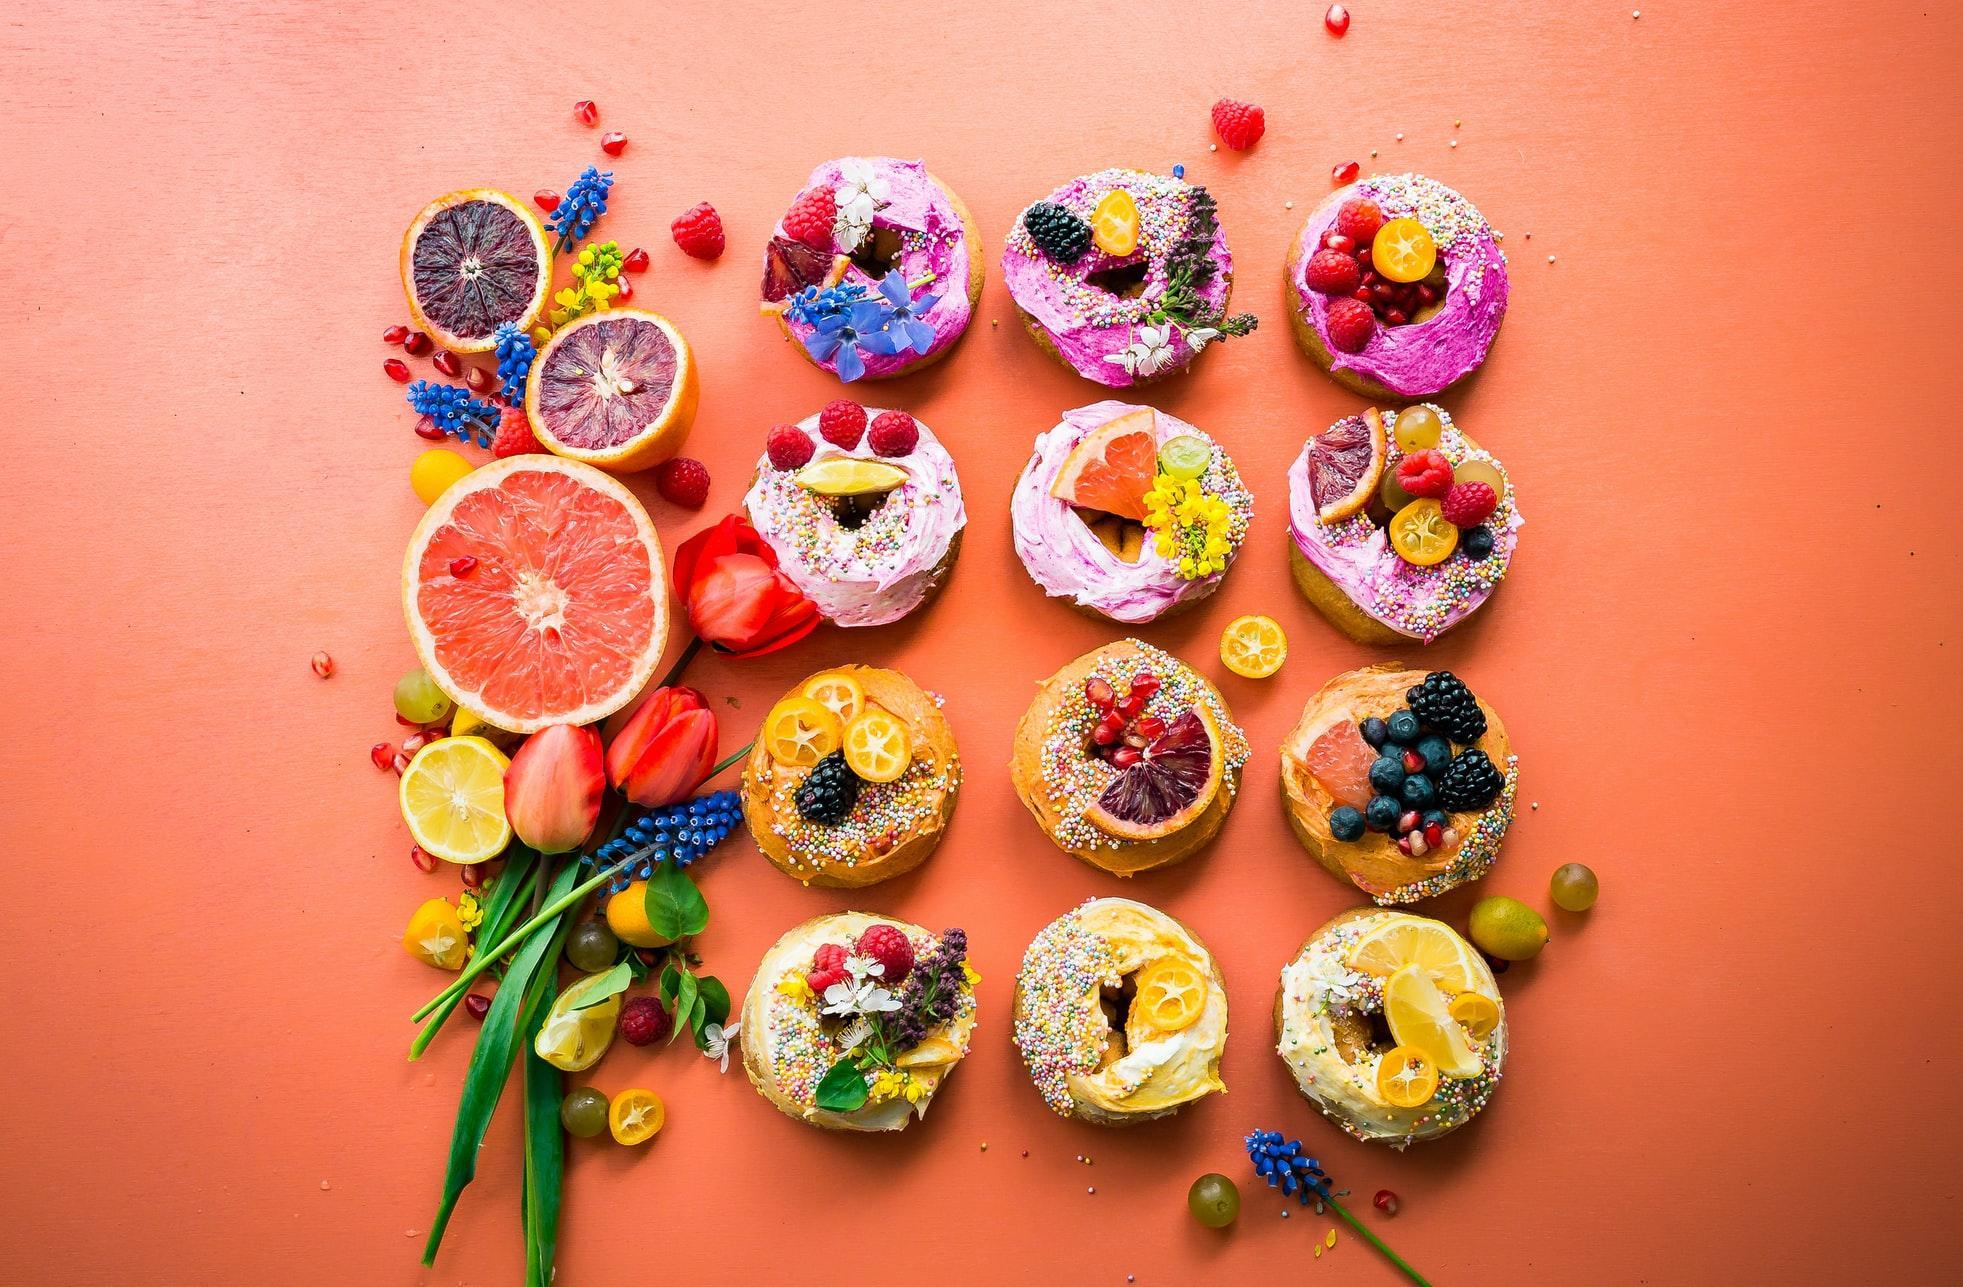 donuty z kremem i owocami